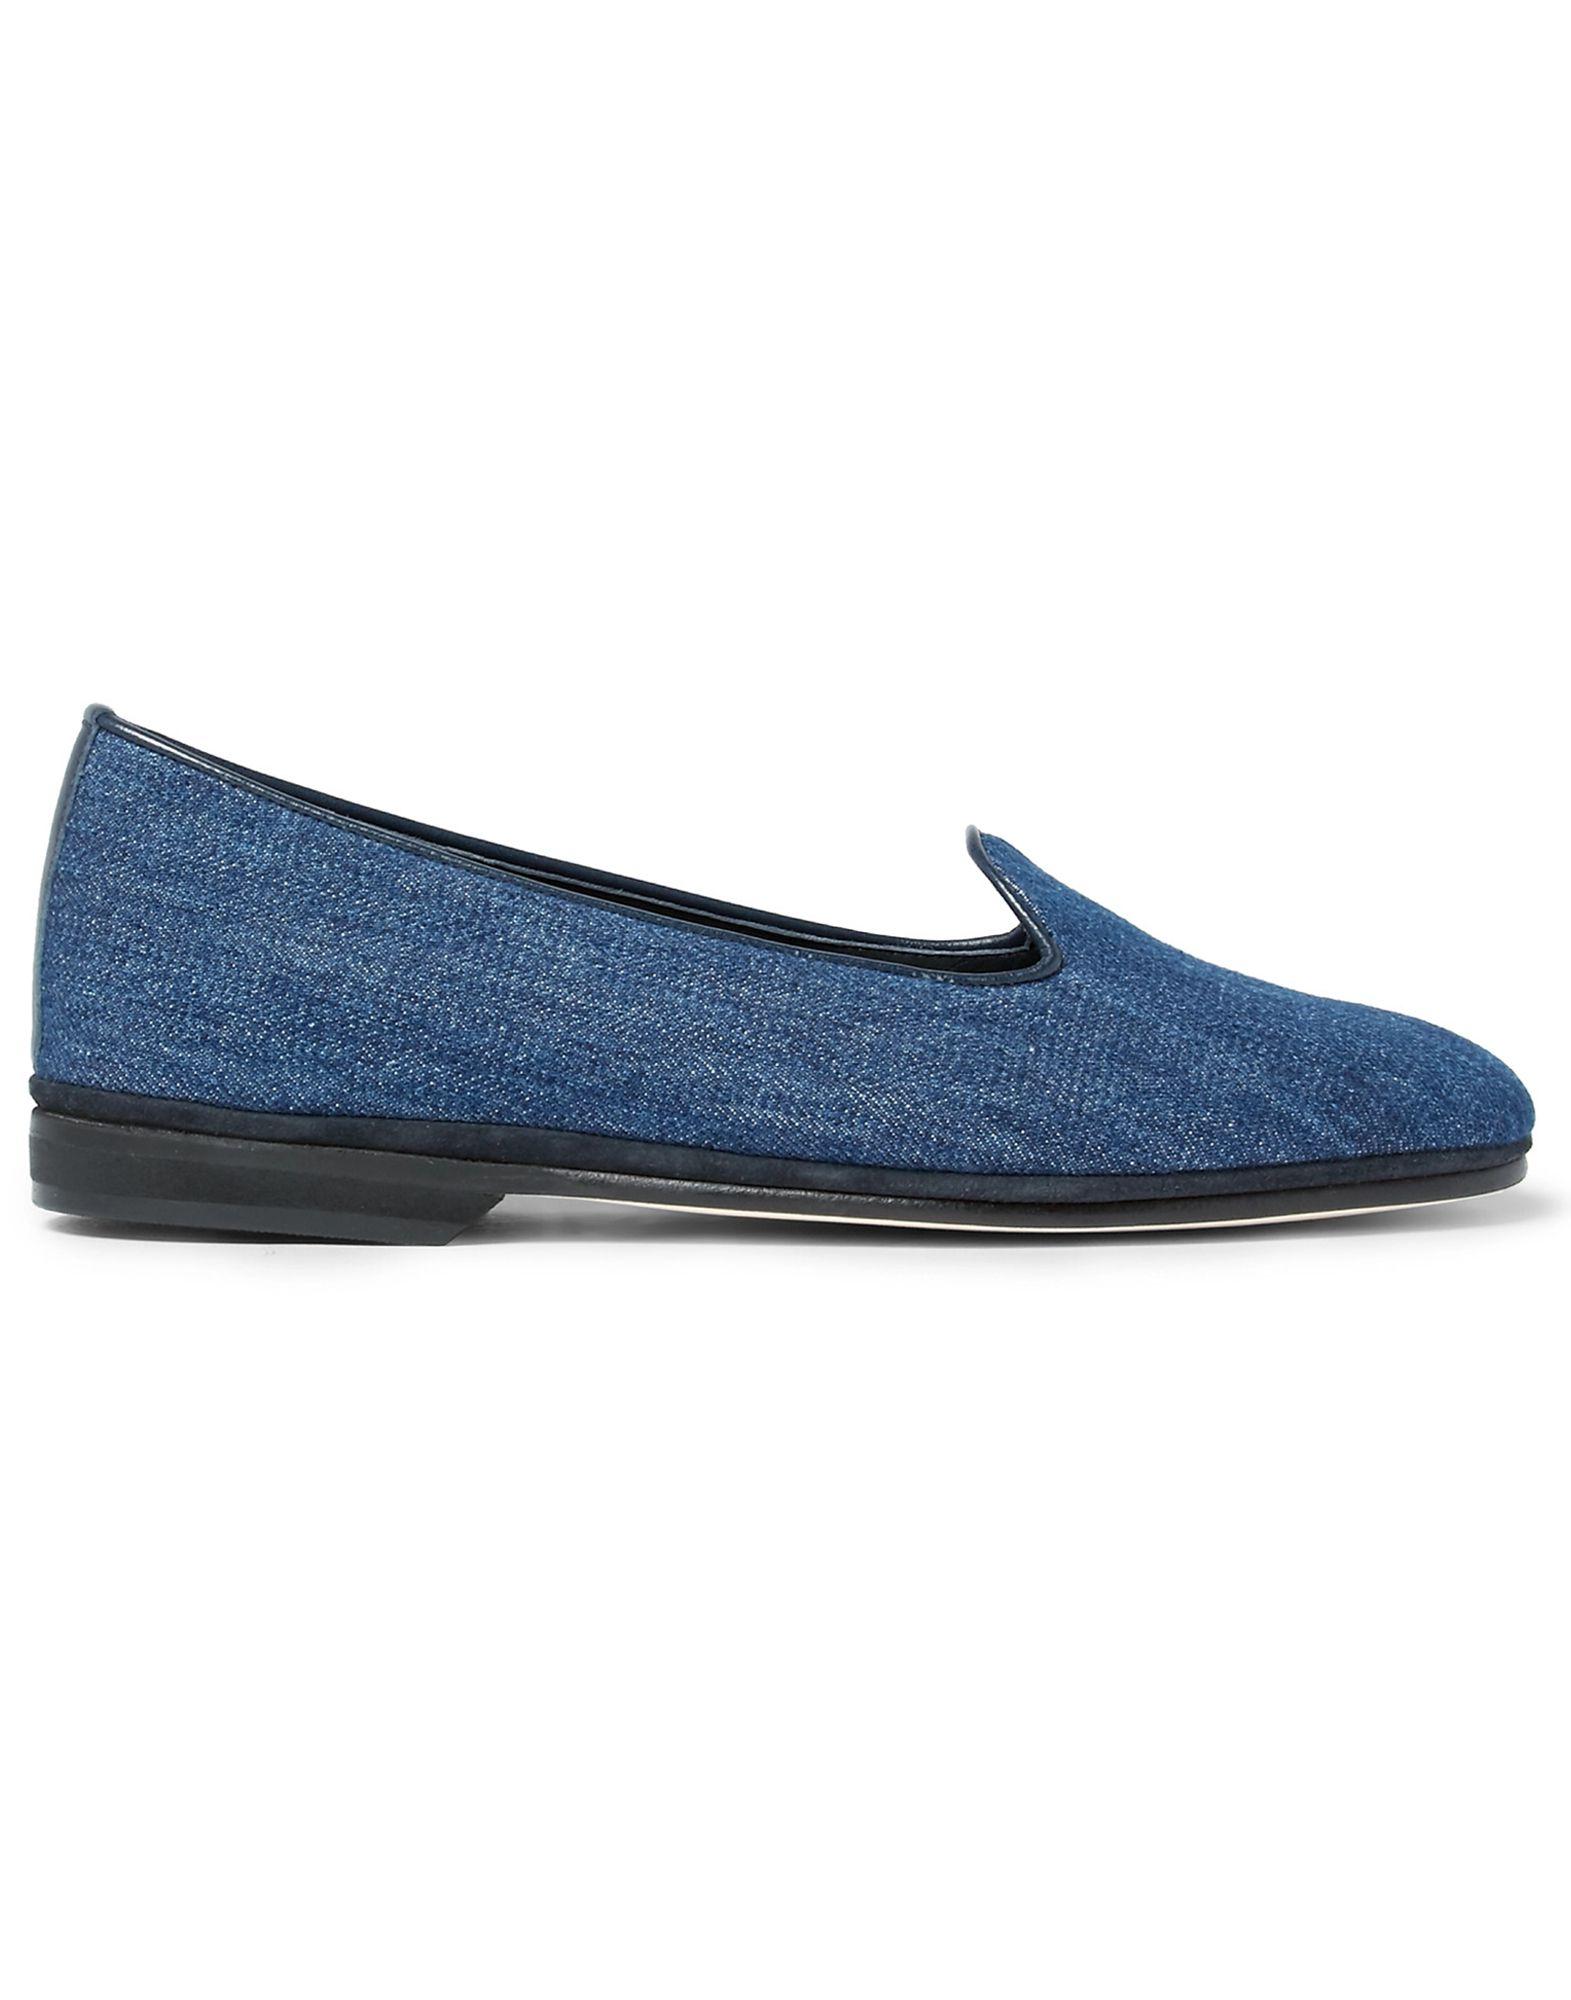 Mariano Rubinacci Mokassins Herren  11540795QC Gute Qualität beliebte Schuhe